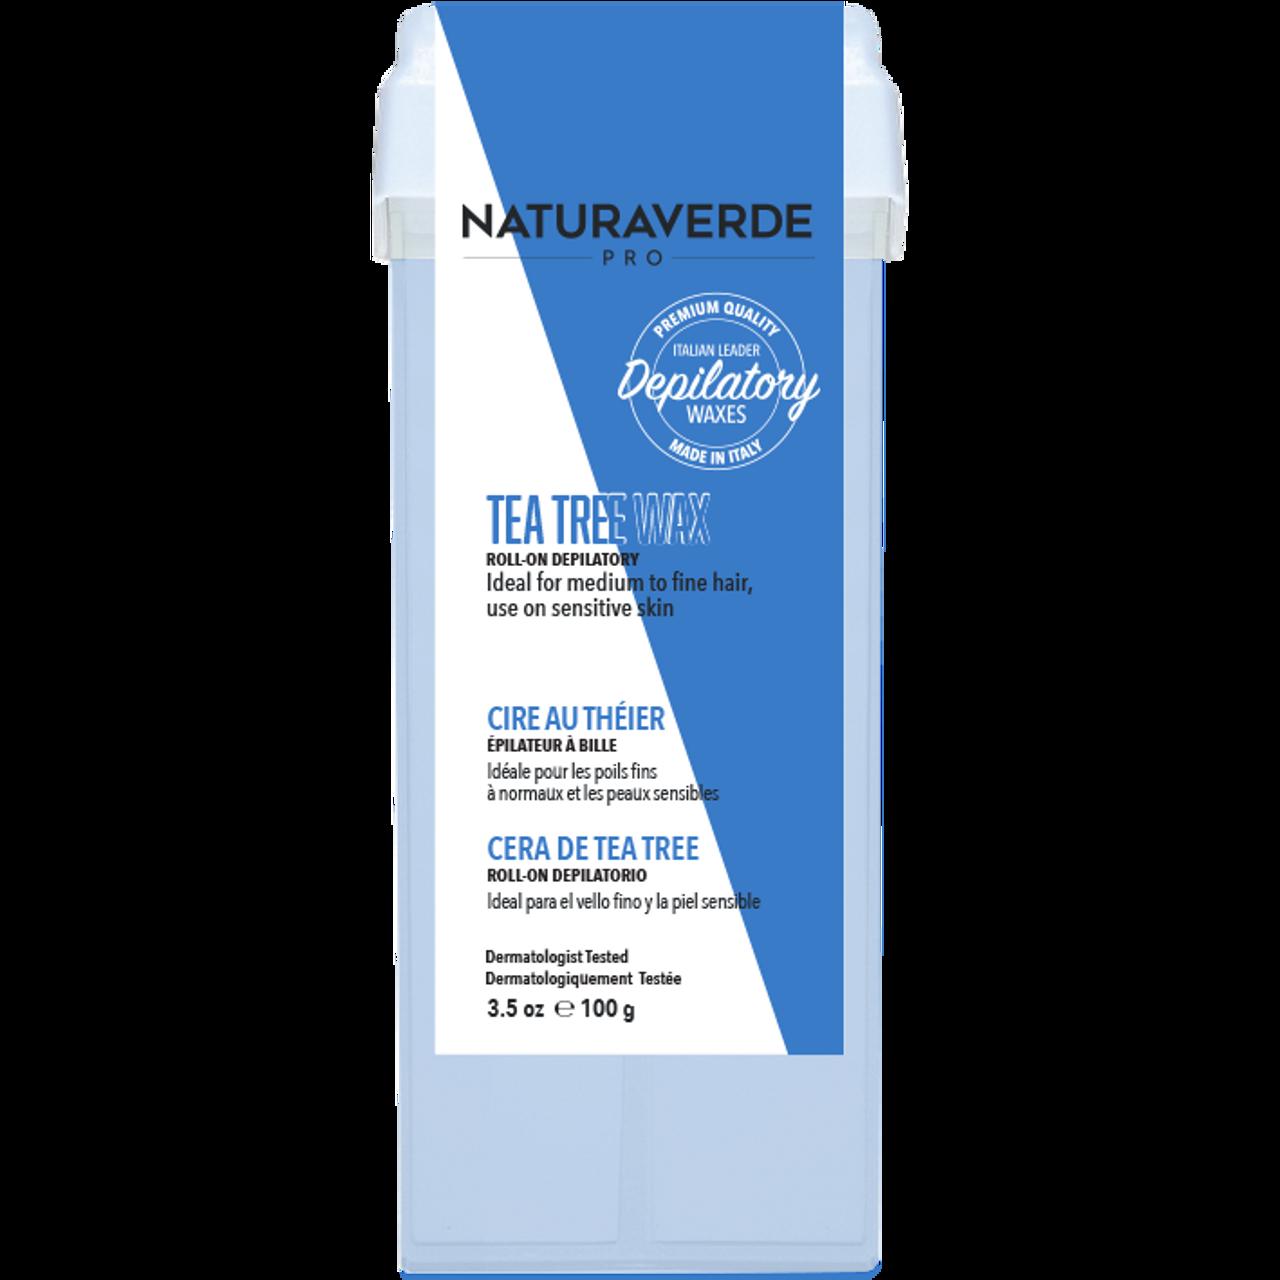 Naturaverde Pro Roll-On Wax Kit with Sensitive Tea Tree Wax - For medium/fine hair, sensitive skin